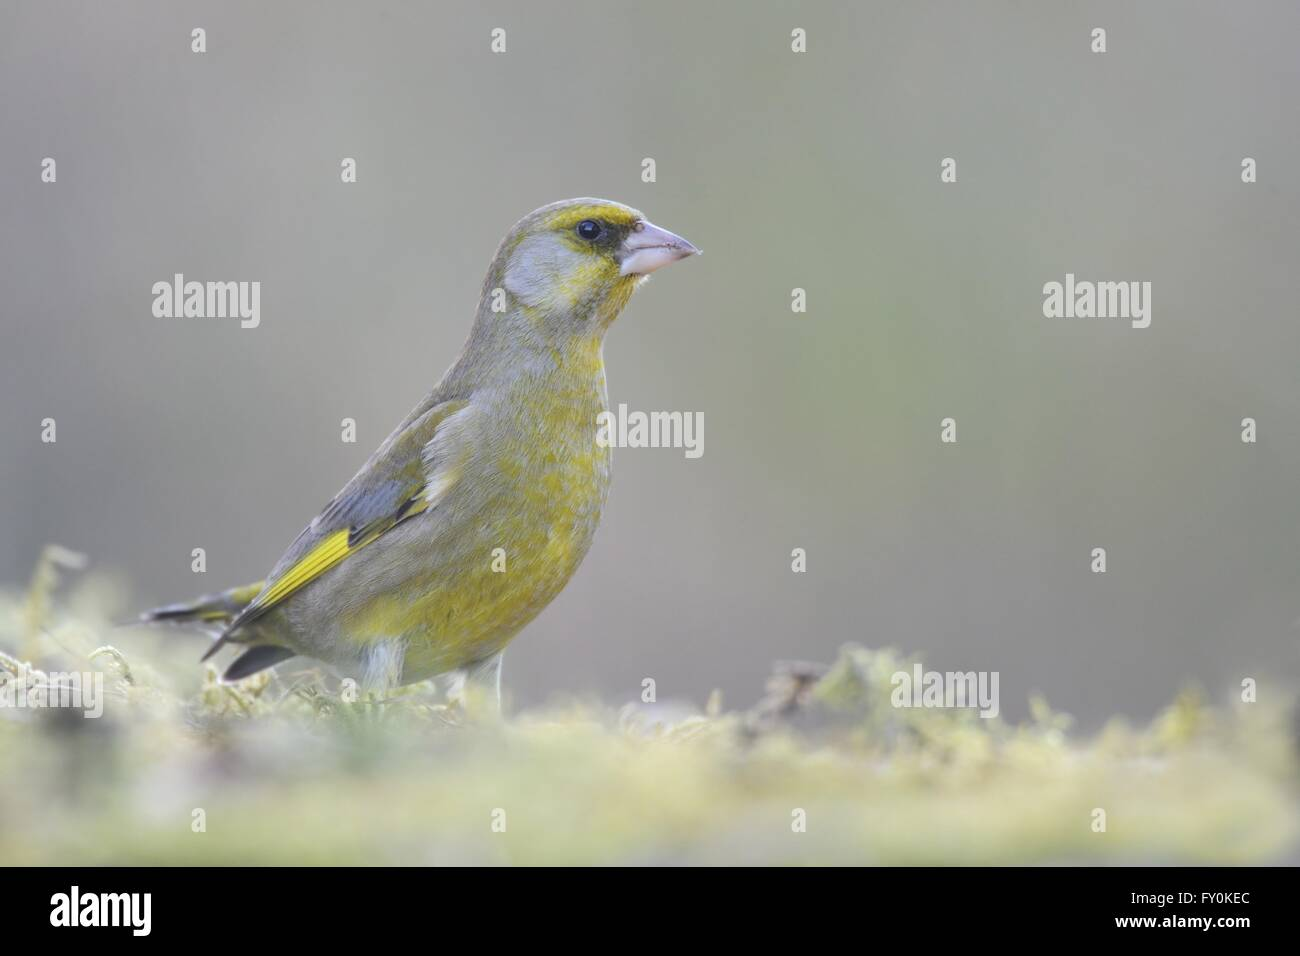 European greenfinch - Stock Image